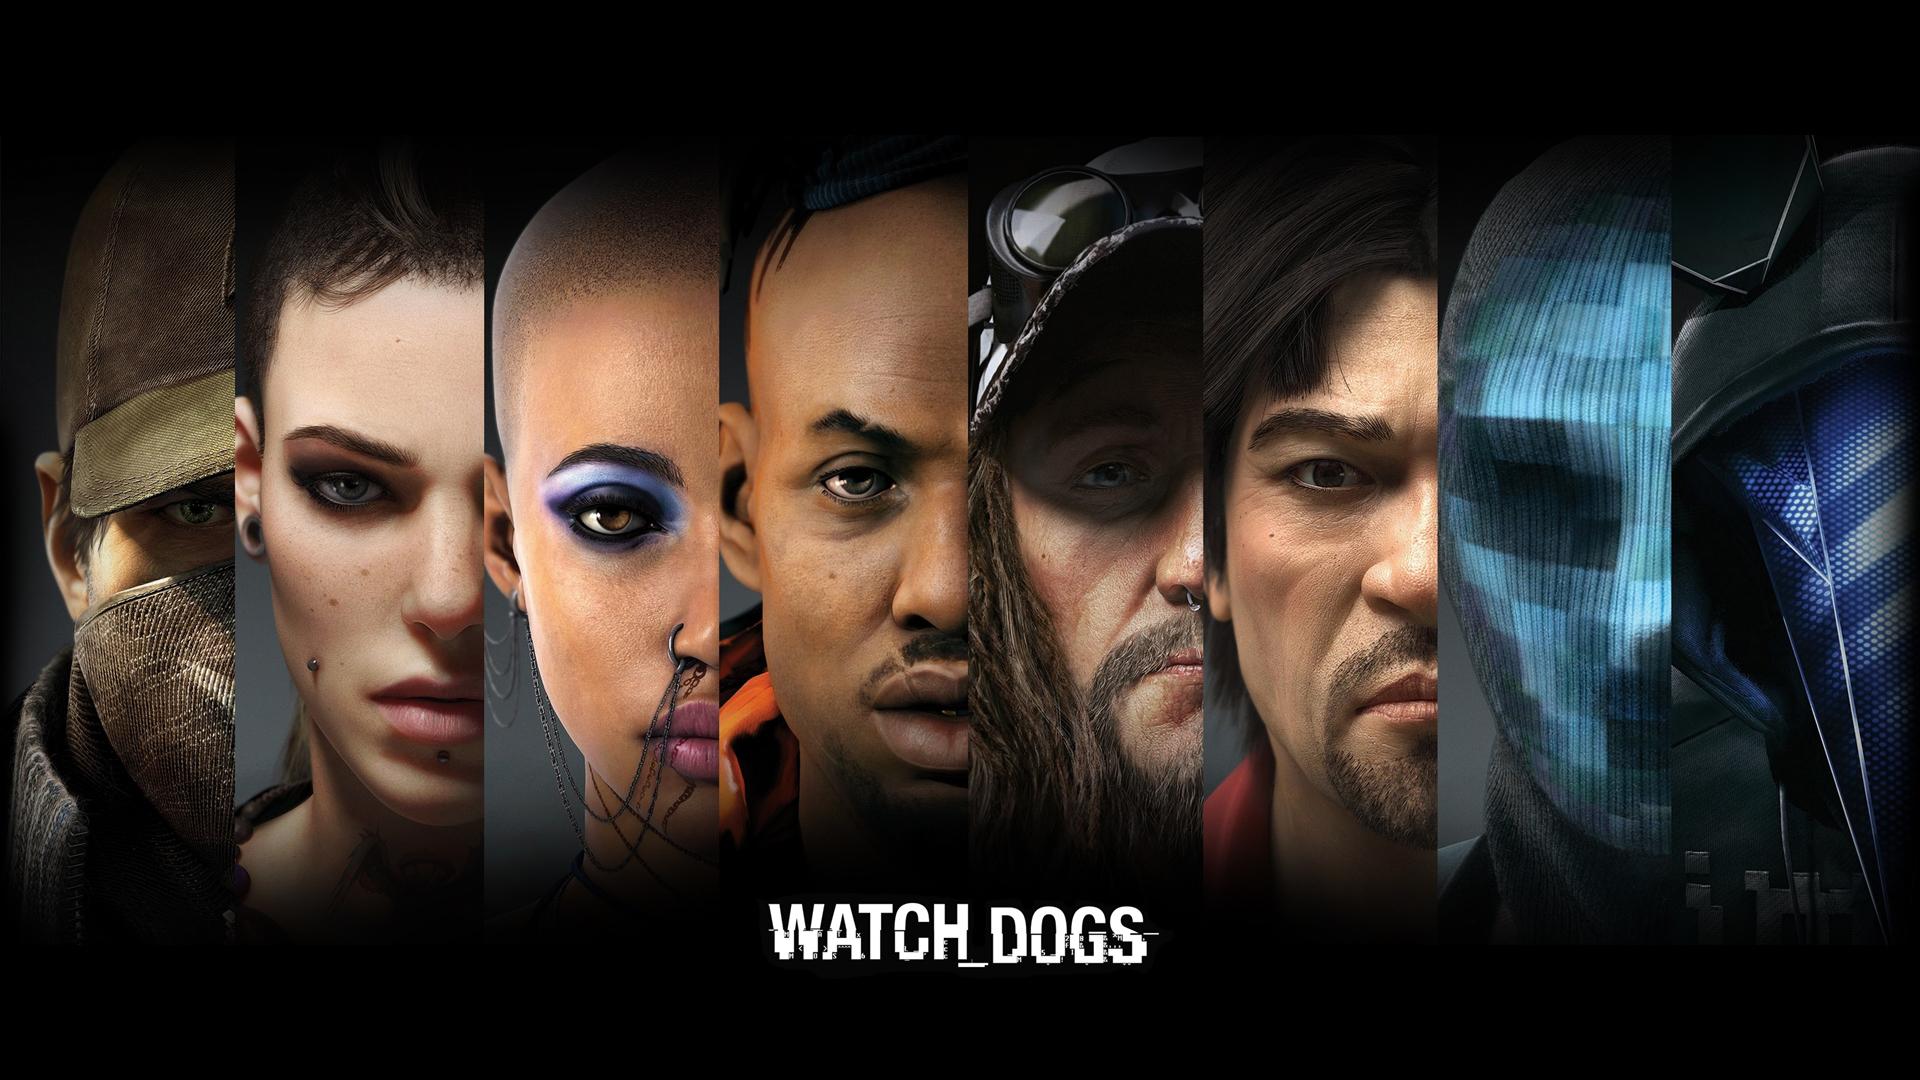 WATCH DOGS CINEMATICS 120'